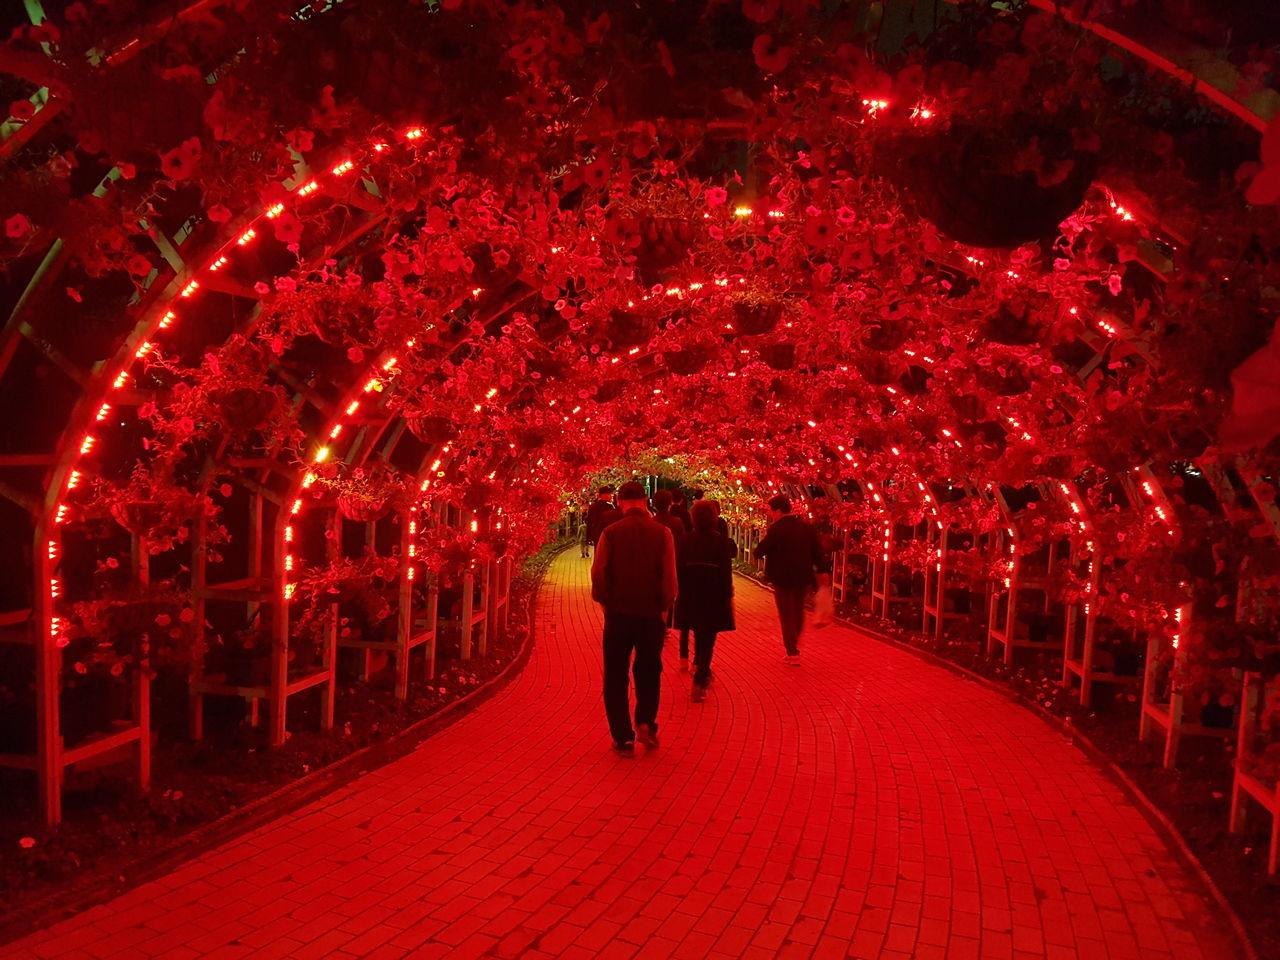 illuminated, red, real people, lighting equipment, night, celebration, walking, lantern, rear view, men, women, indoors, tree, adult, people